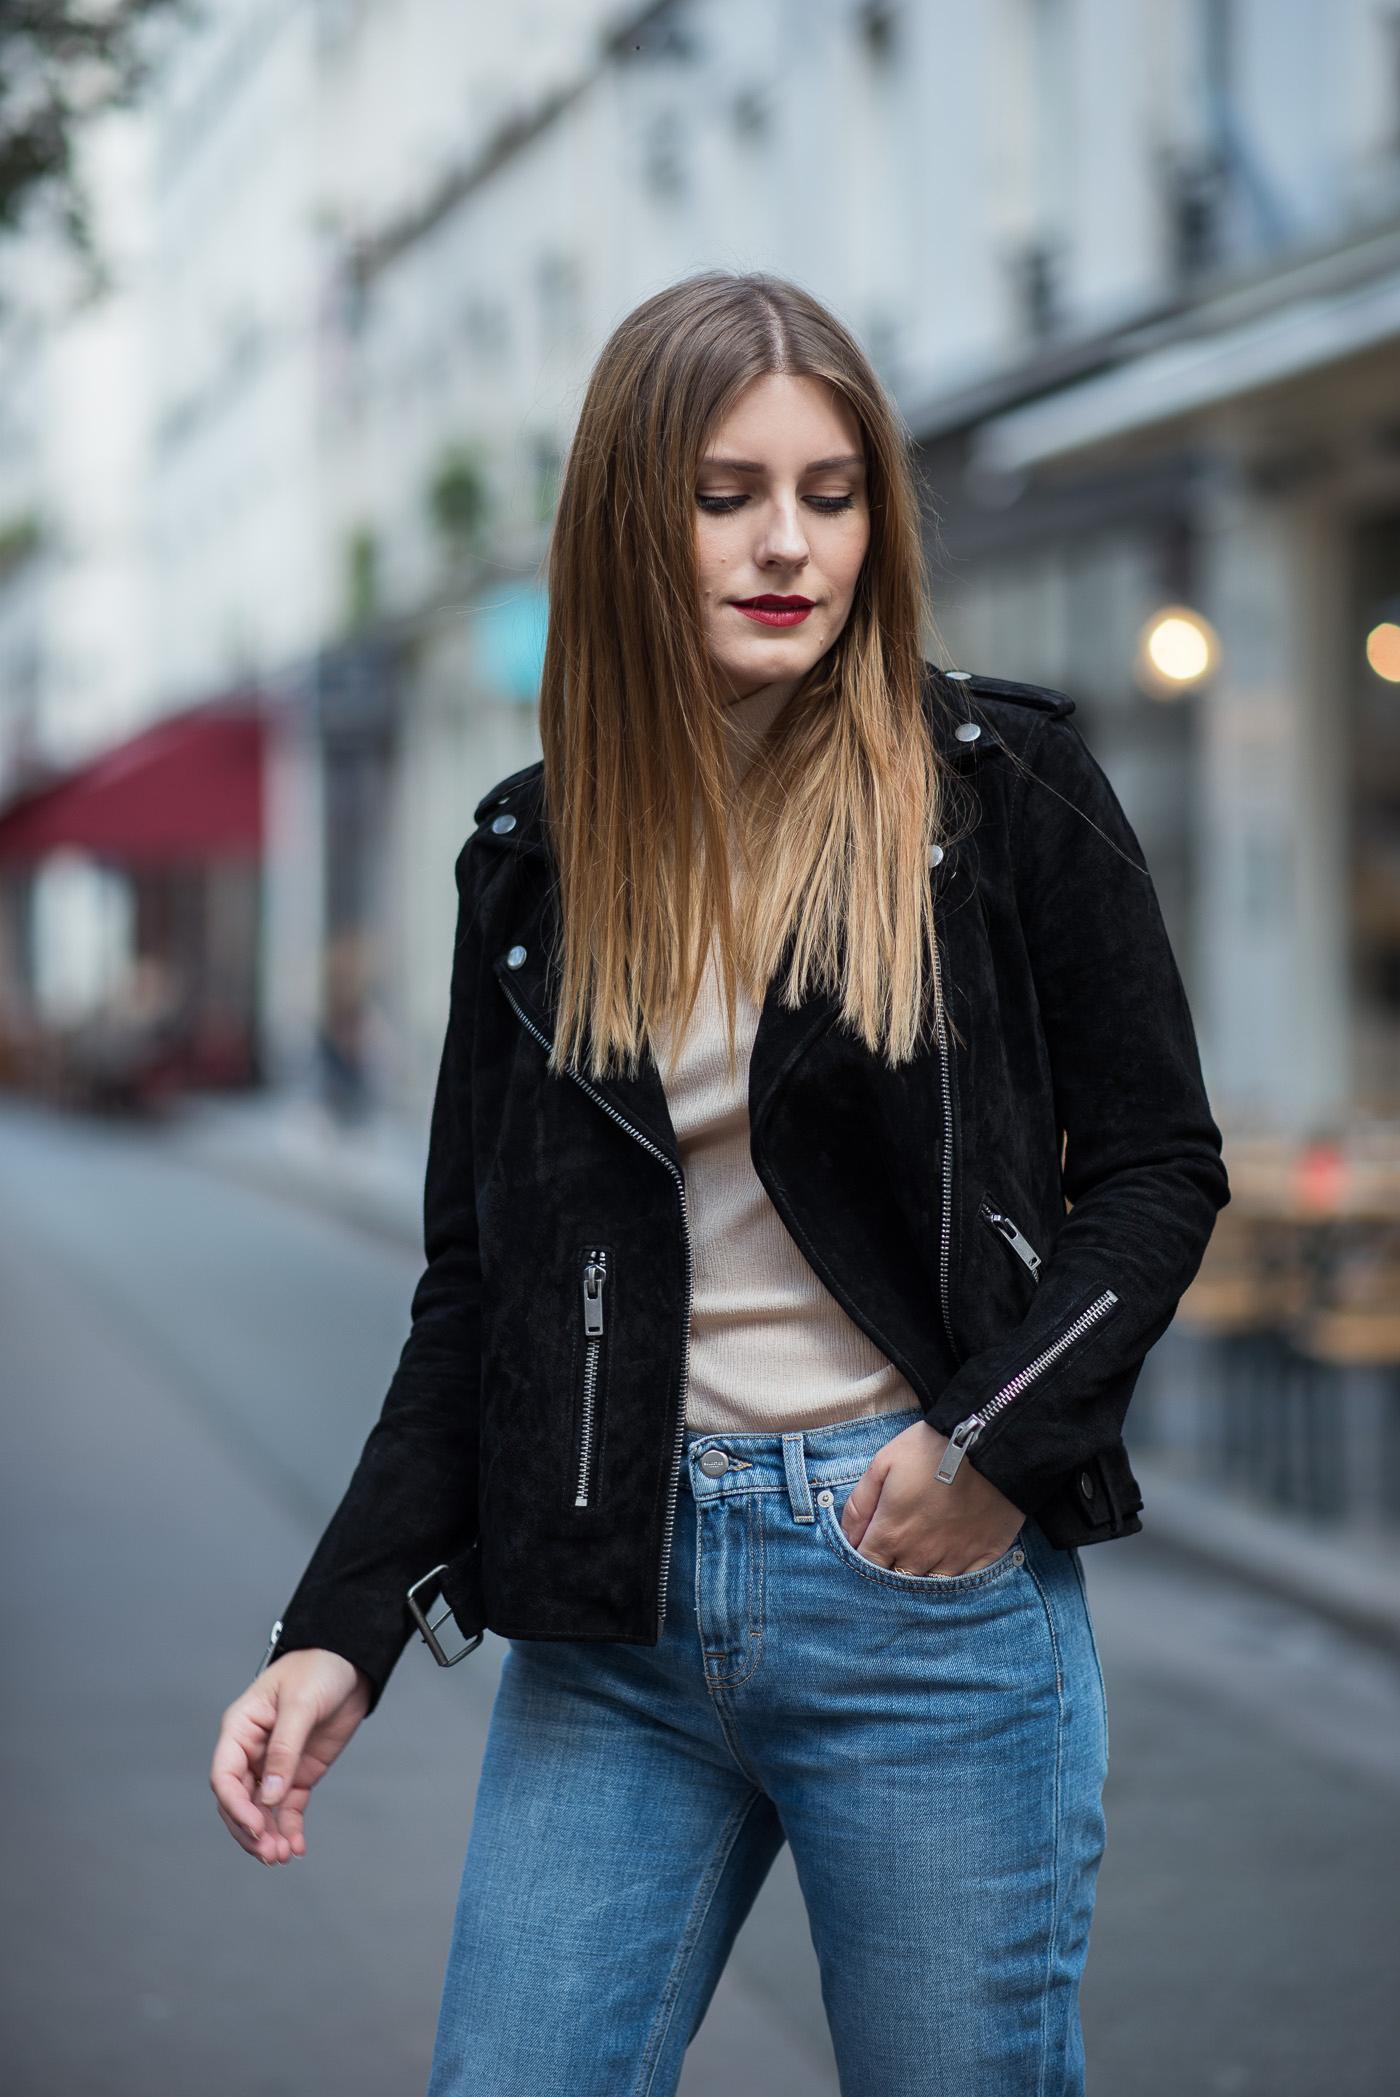 paris_fashion_week_leather_jacket_selected_femme_6